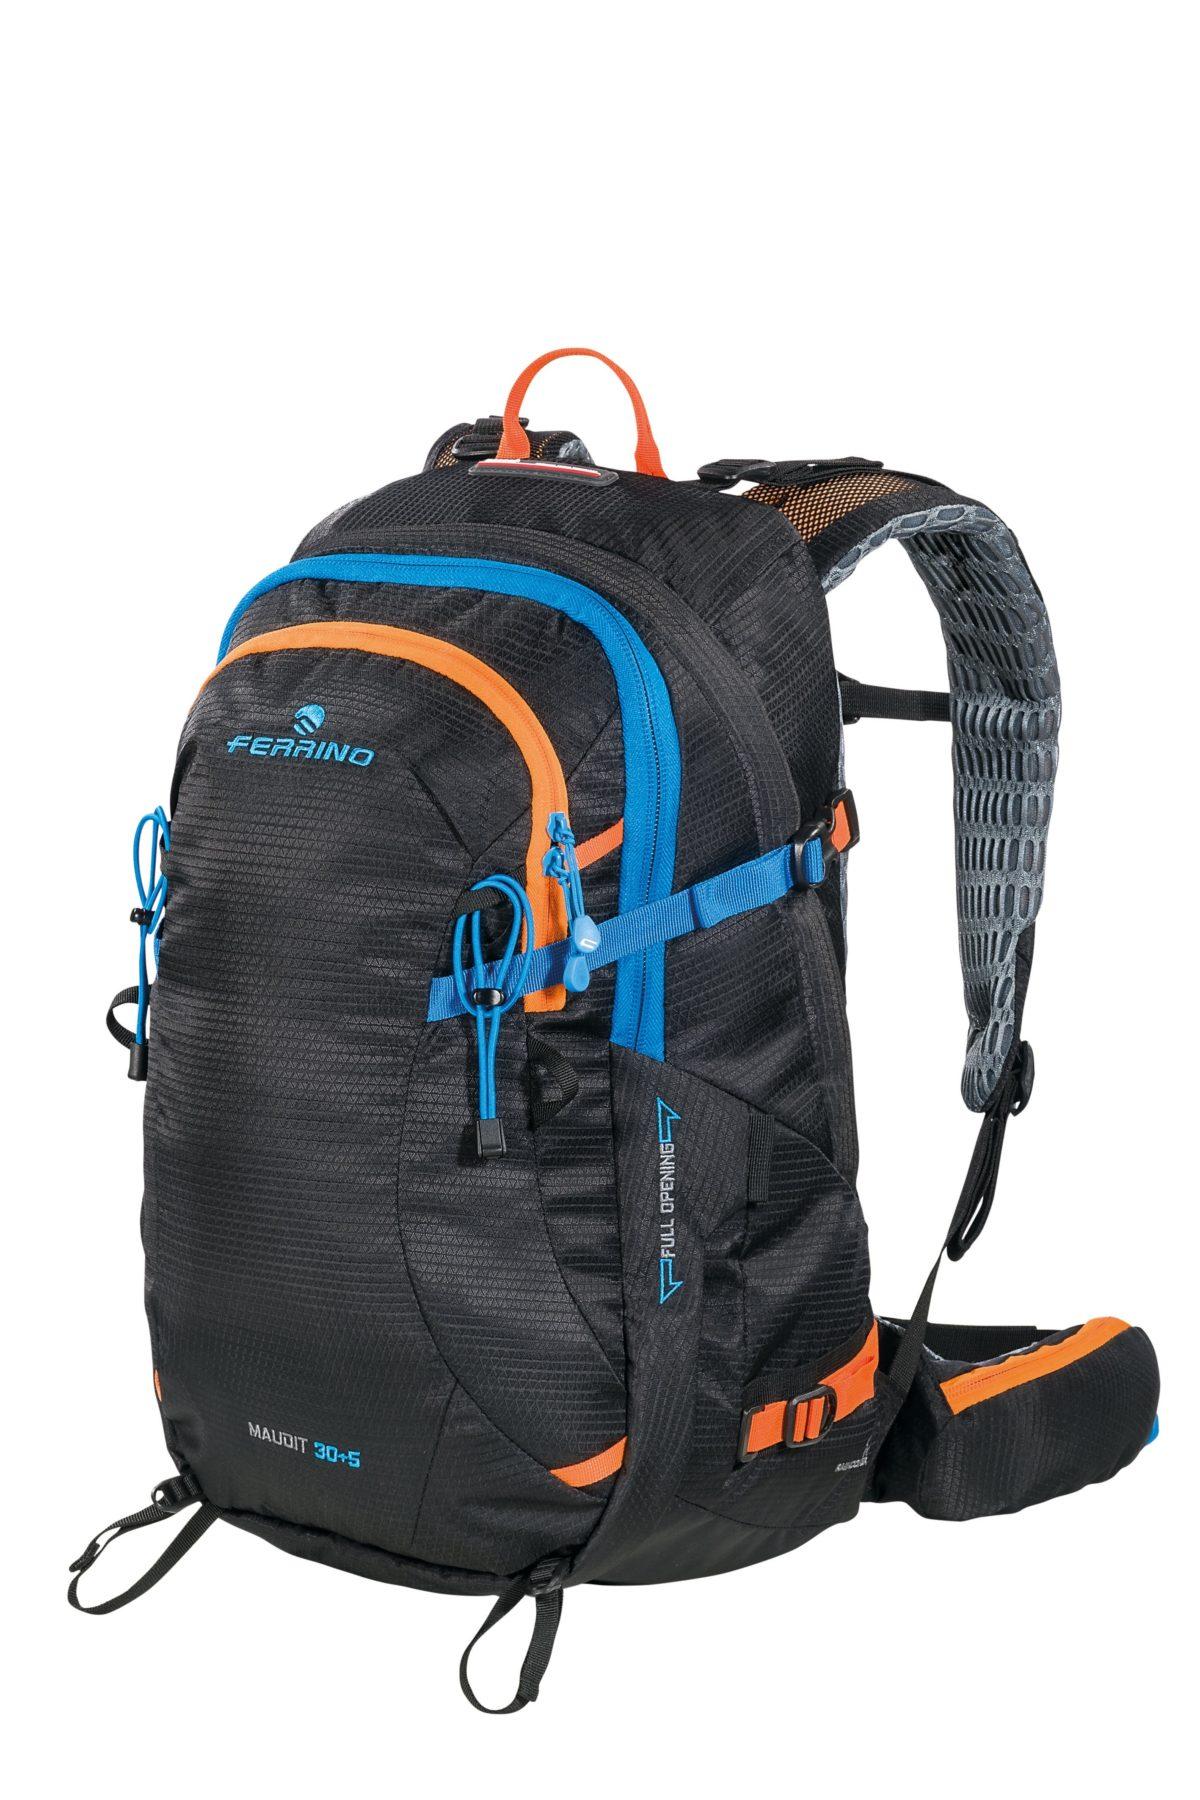 Ferrino horolezecký batoh Maudit 30+5 NEW 1